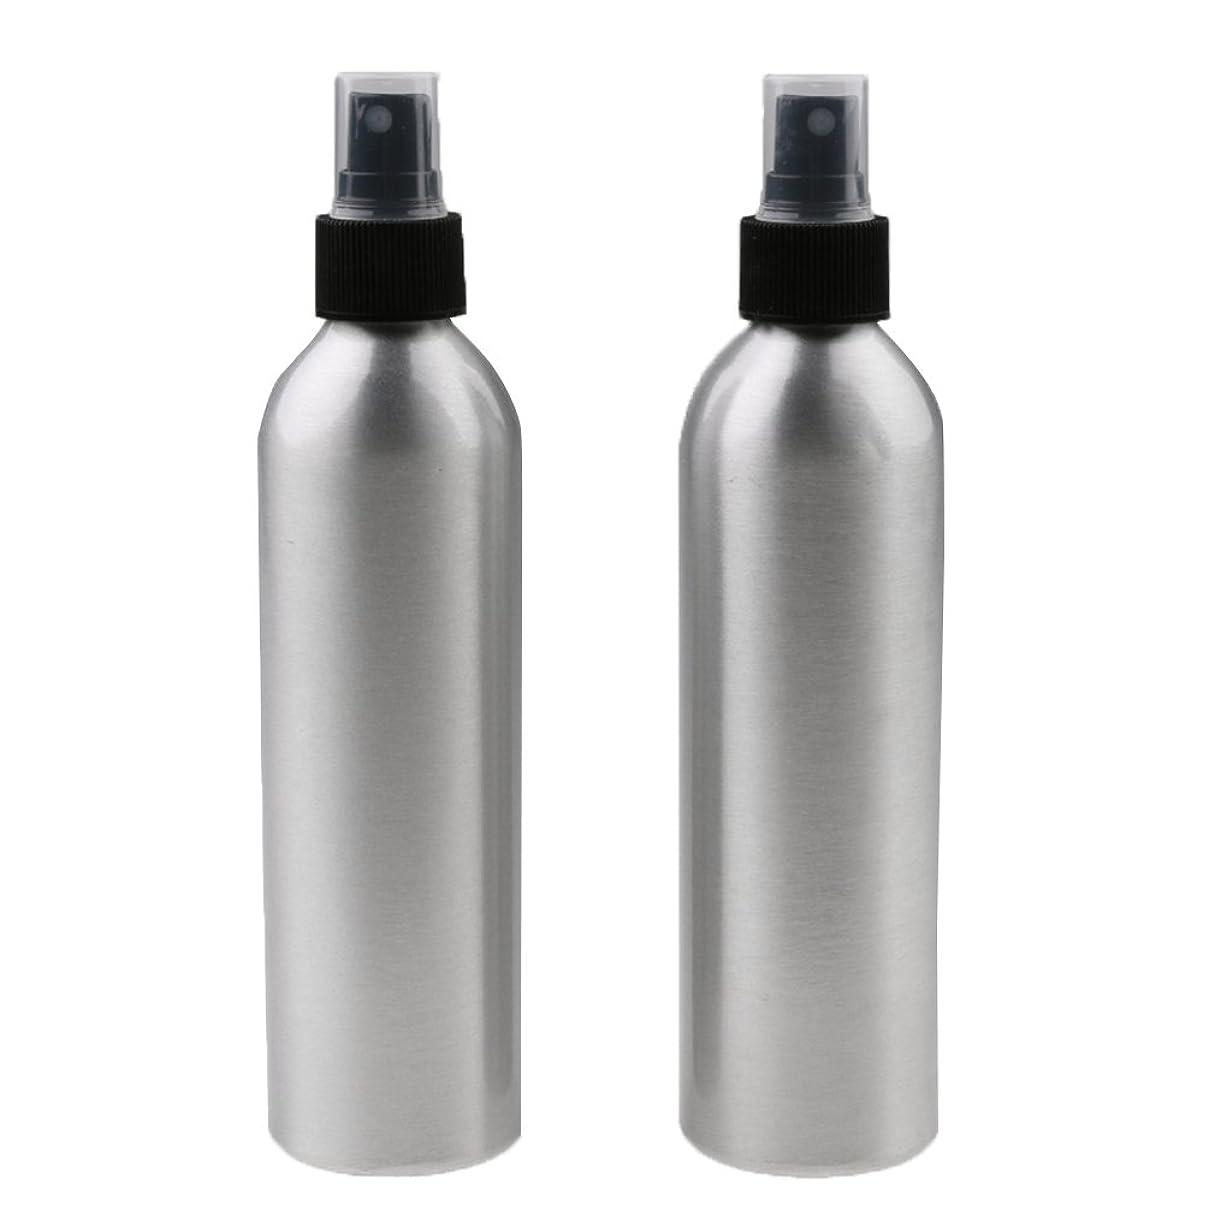 Fenteer 2個 スプレーボトル 旅行 ミスト スプレー 香水ボトル メイクアップ アトマイザー 美容 小物 軽量 持ち運び便利 全4サイズ - 250ml